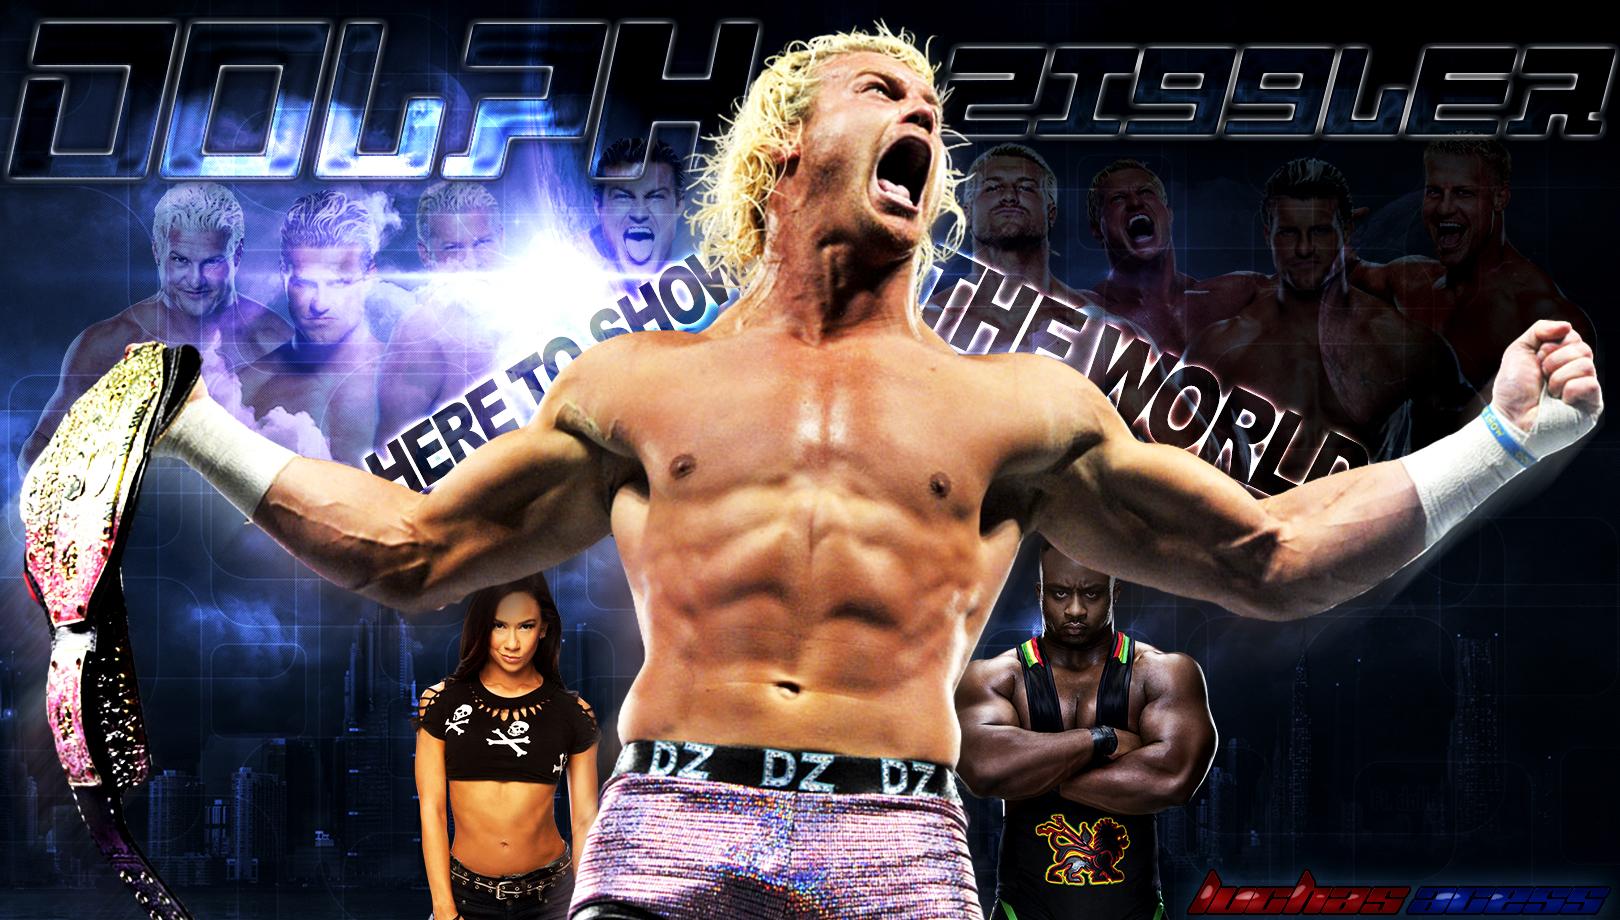 Dolph Ziggler World Heavyweight Champion Wallpaper world heavyweight ... Dolph Ziggler World Heavyweight Champion